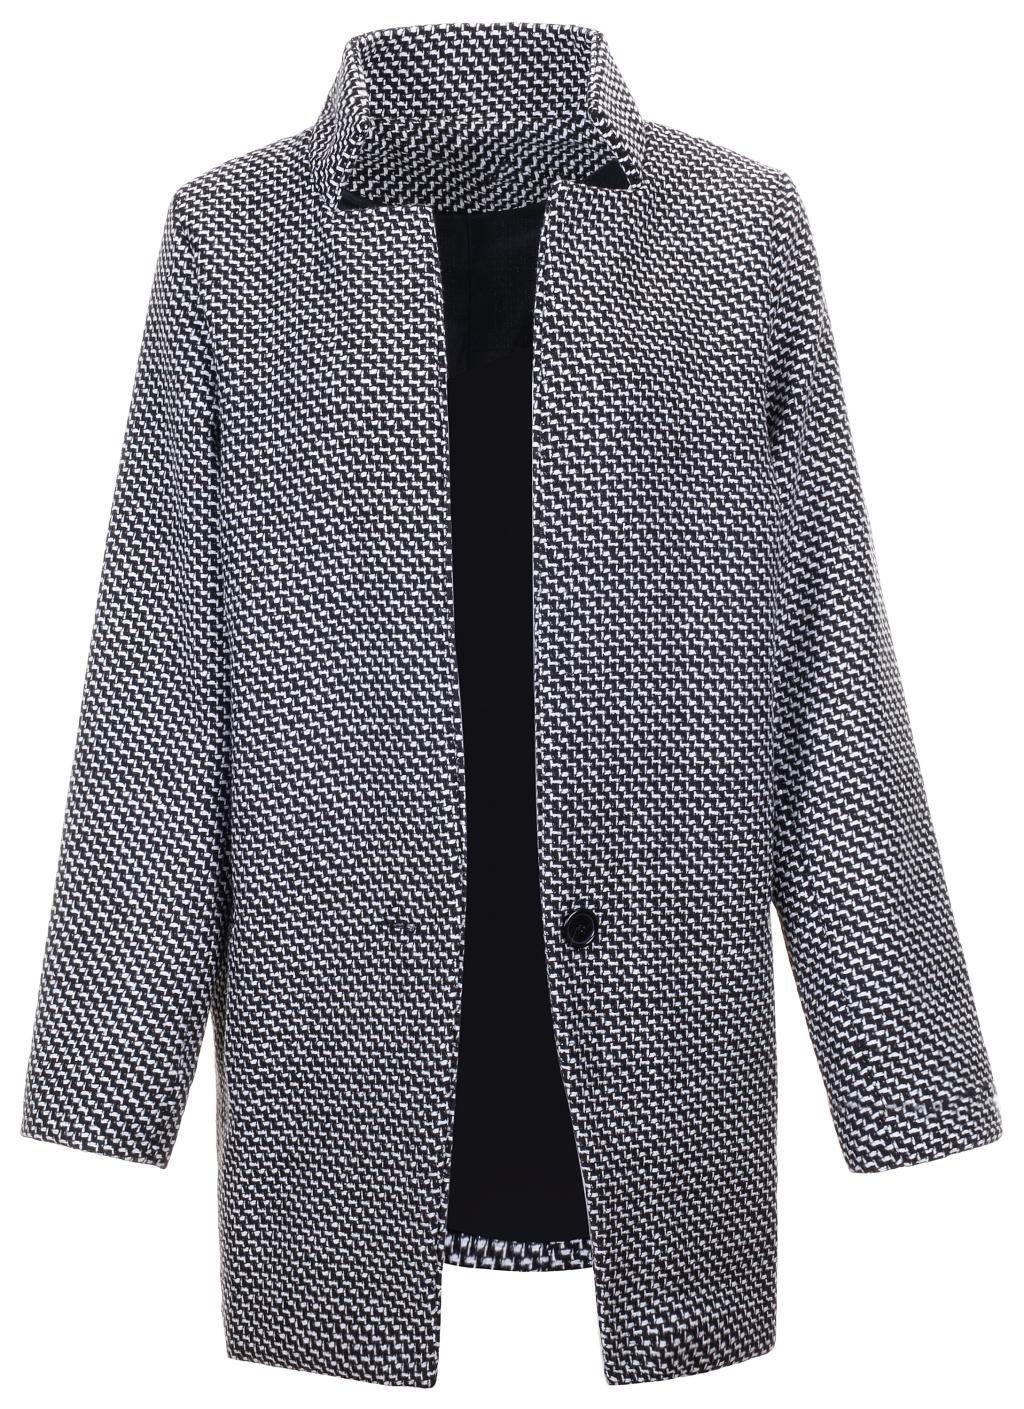 QZUnique Women's Fashion Style Slim Fit Thicken Wool-Blend Cocoon Coat Gray S